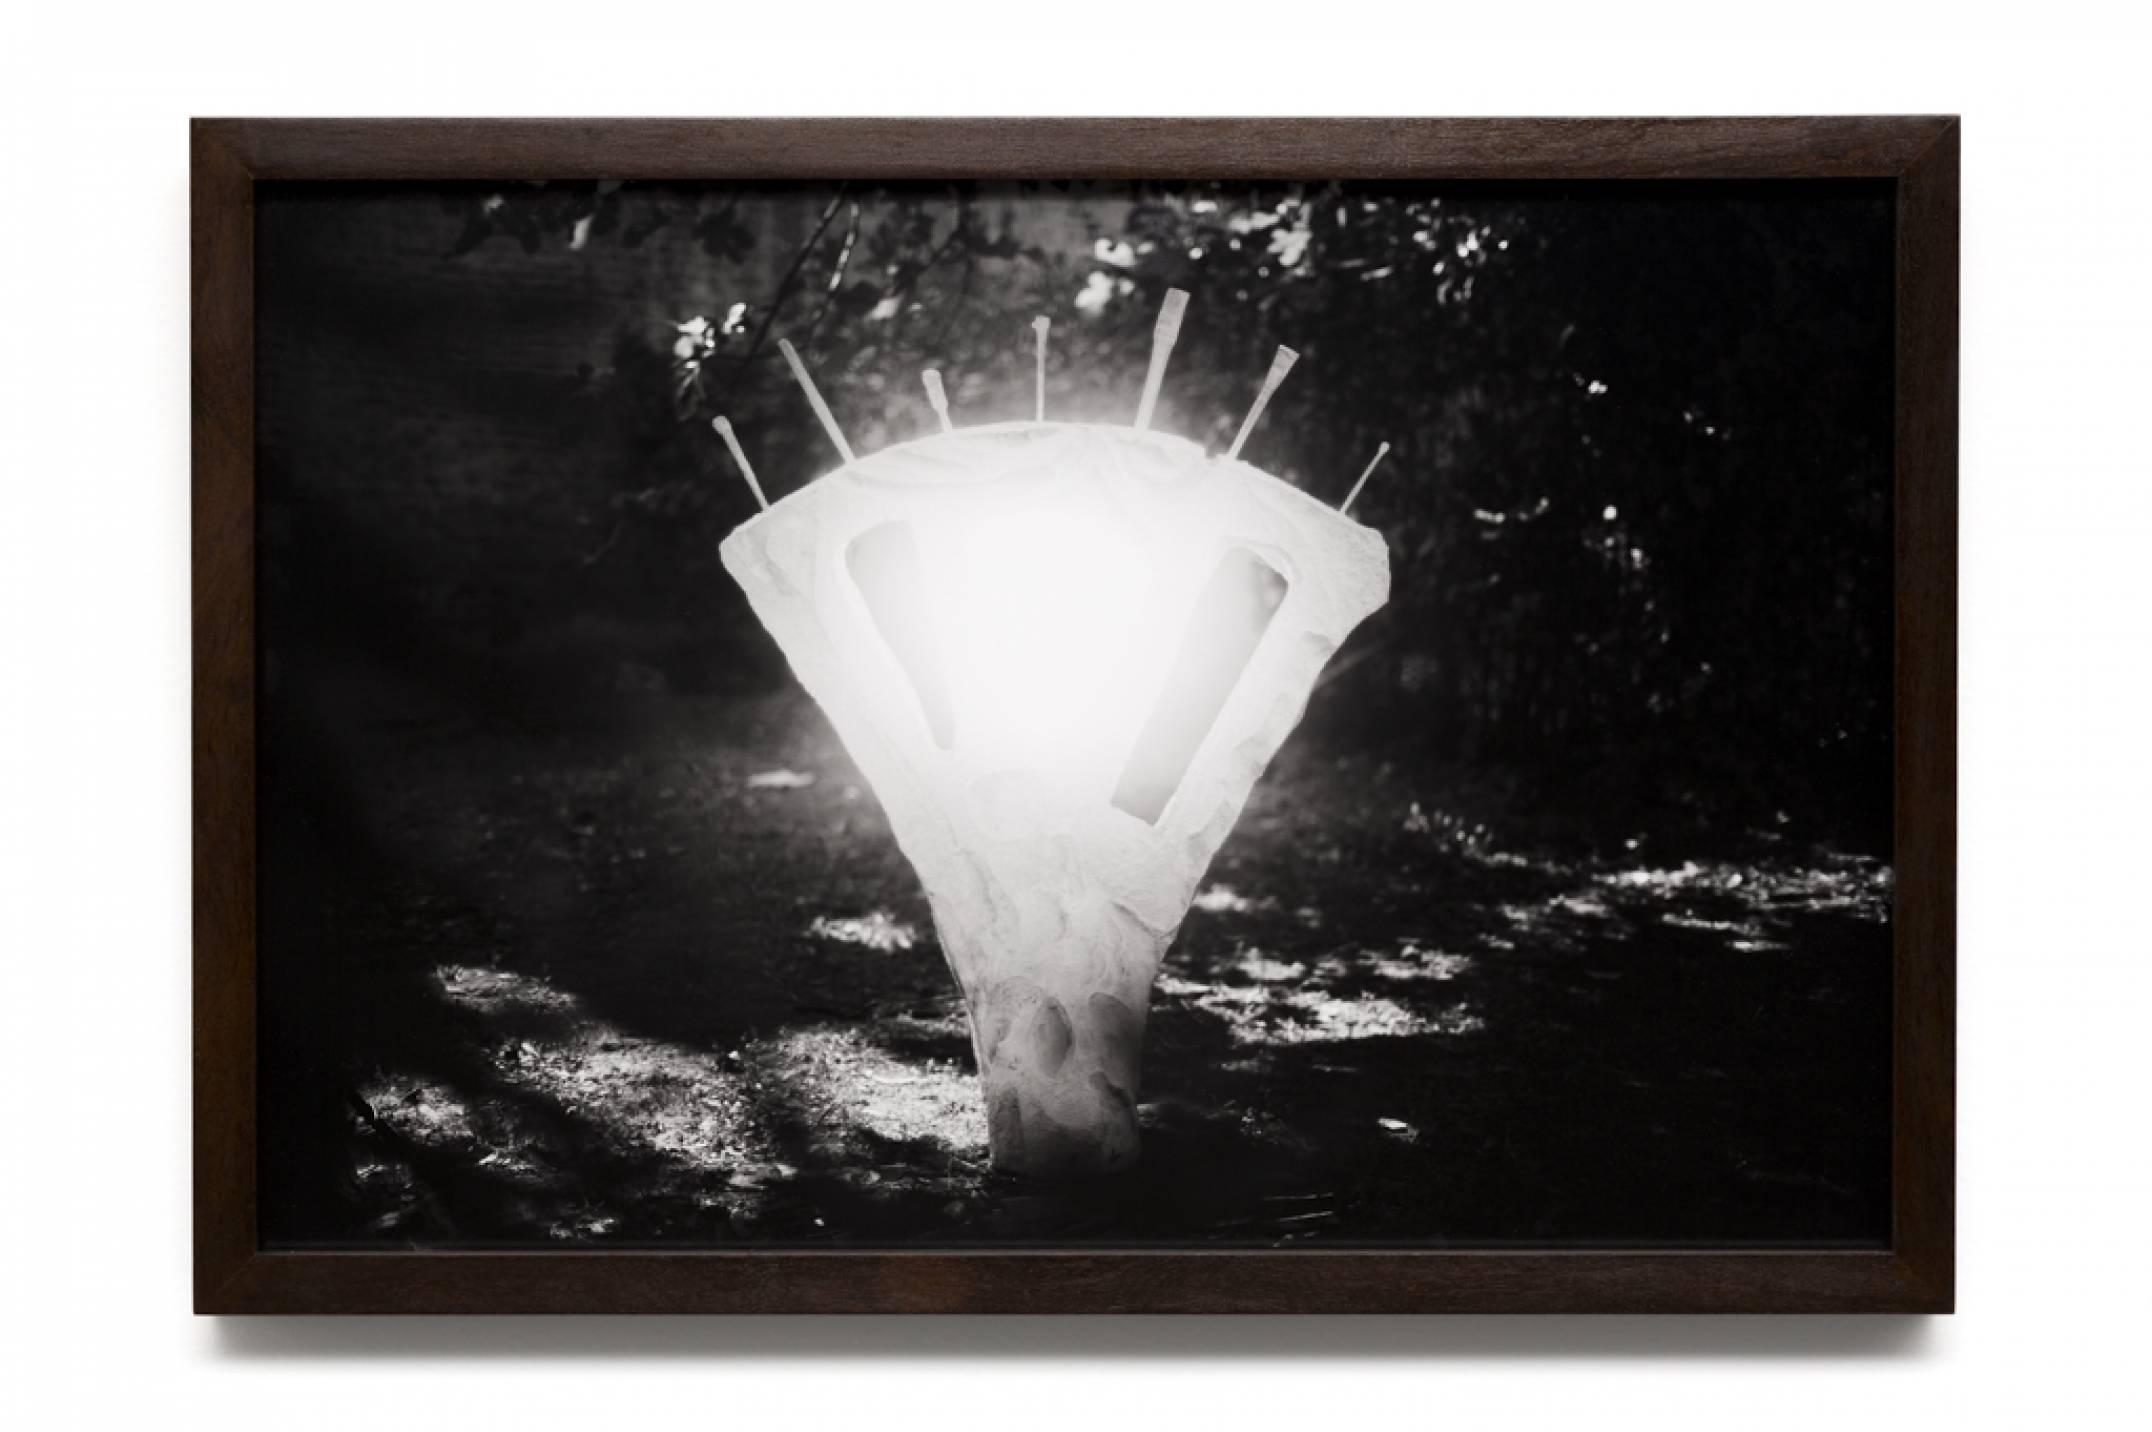 Luiz Roque &amp; Erika Verzutti, <em>Ghost, </em>2017, photograph, 36,5 × 55 cm - Mendes Wood DM